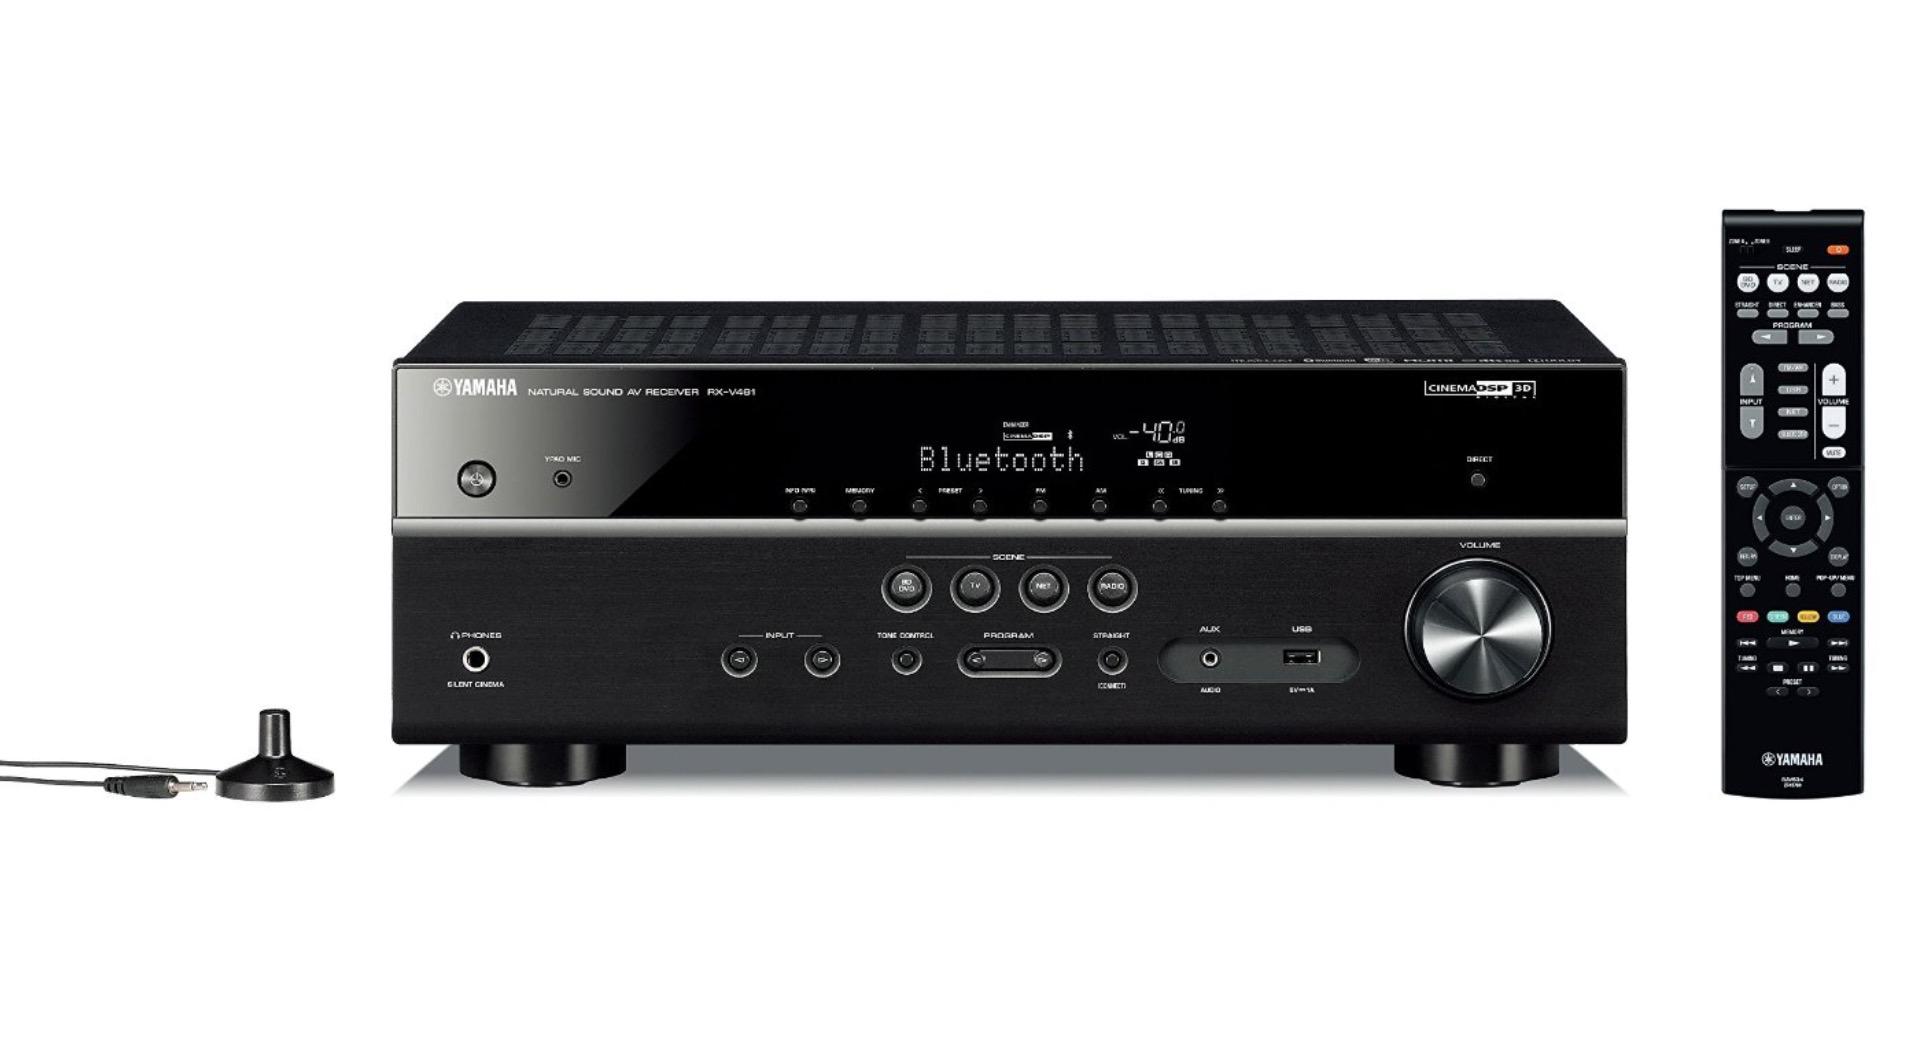 Yamaha MusicCast RX V481